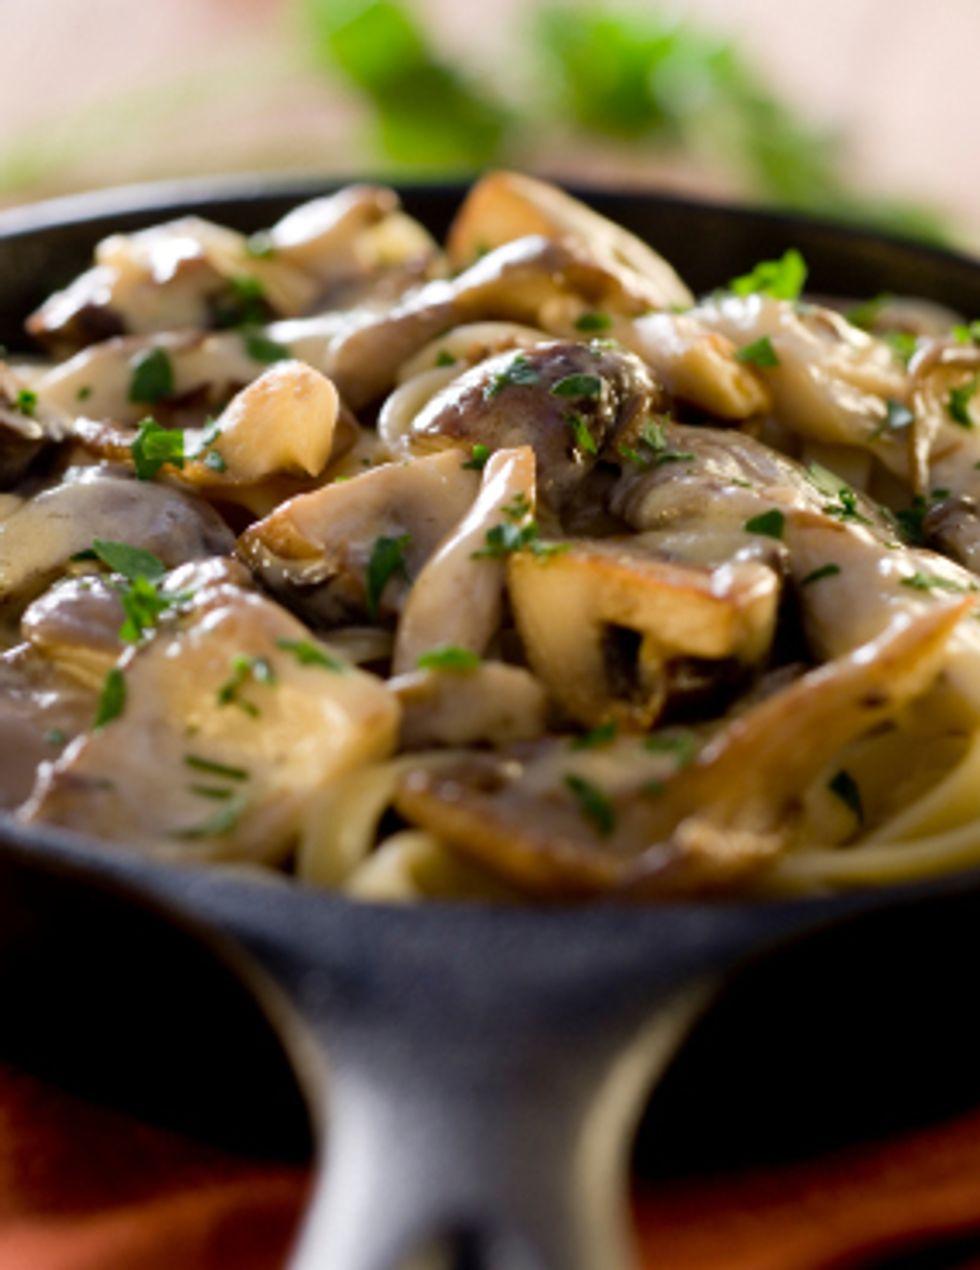 Cholesterol-Busting Oyster Mushroom-Okra Medley